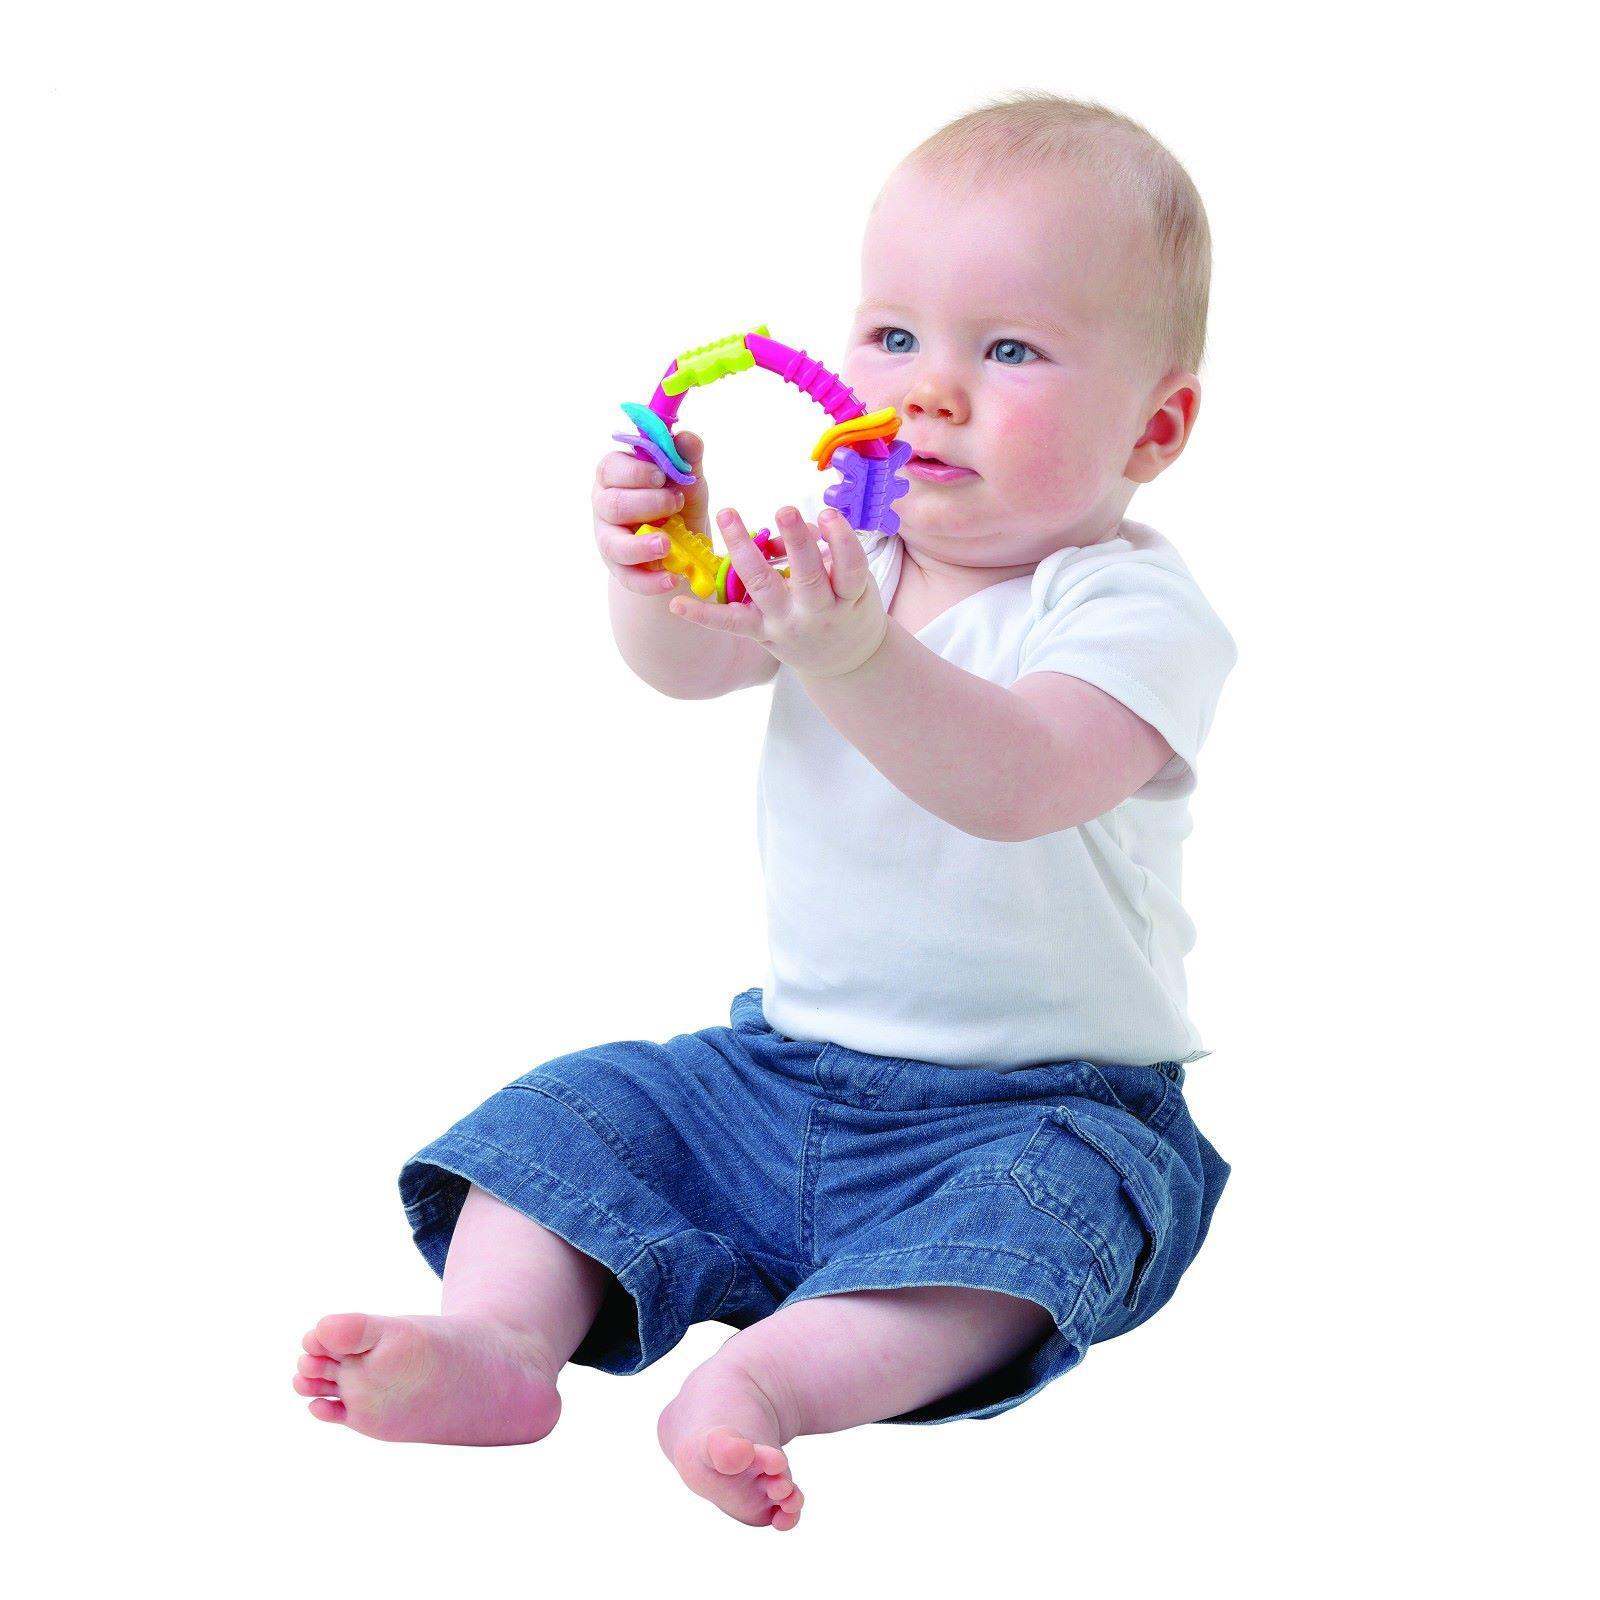 Картинки малыш с погремушками